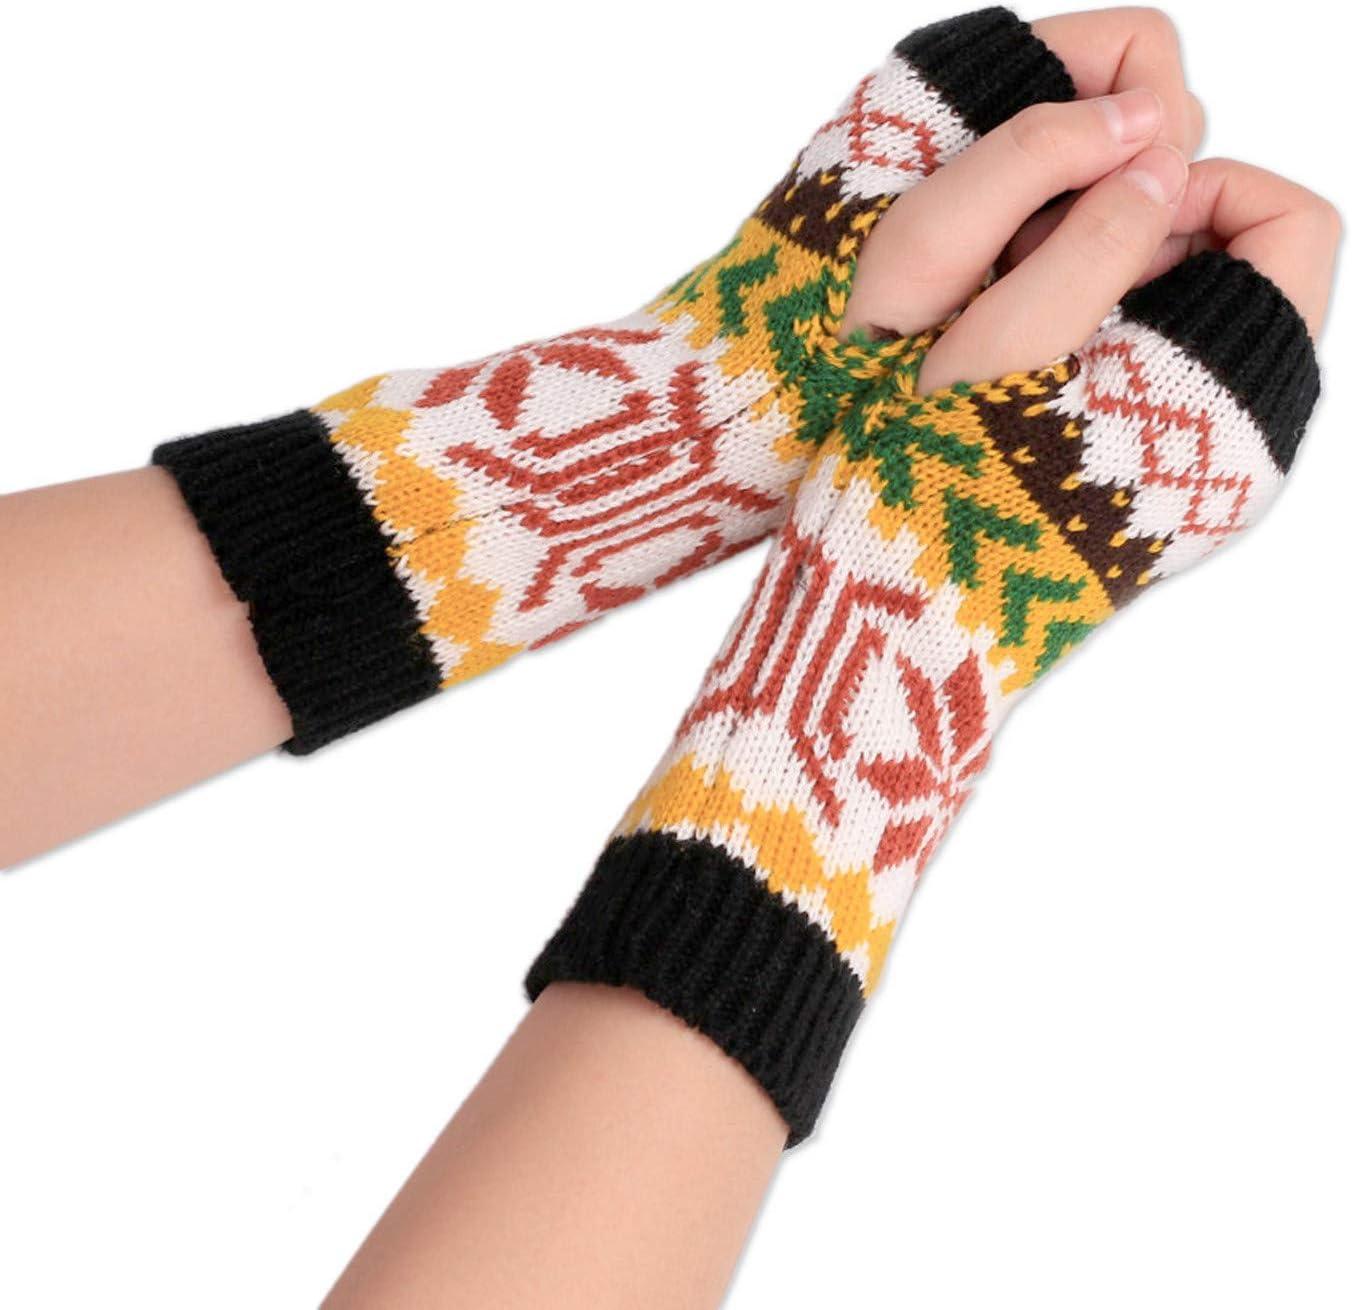 Smoxx Winter Gloves for Women, Fingerless Gloves for Women, Gloves for Women Cold Weather, Warm Gloves Girls Gloves, Fashion Women Wool Knit Fingerless Snowflake Pattern Keep Warm Gloves